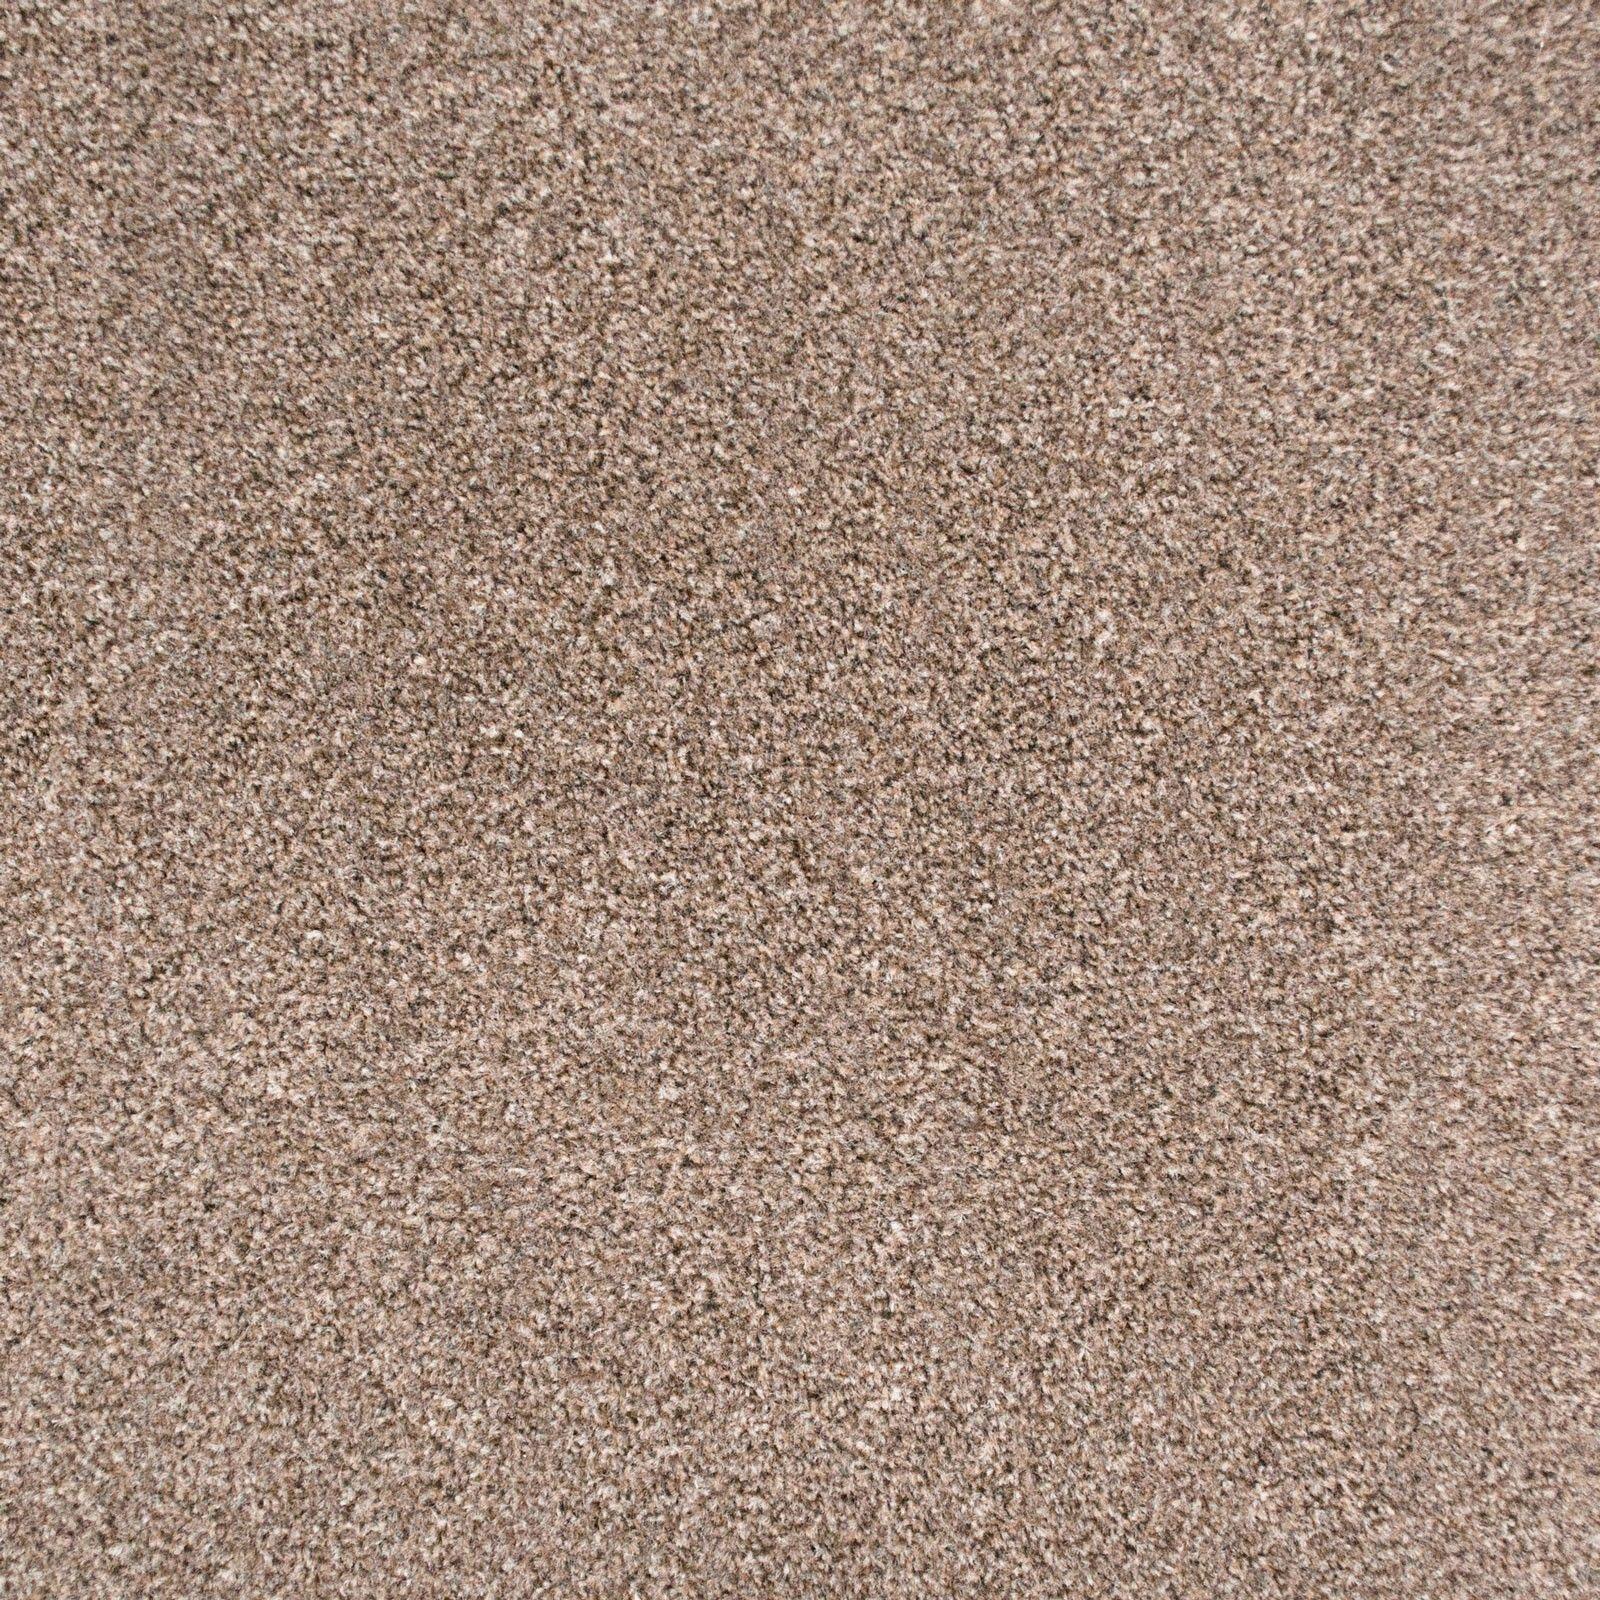 Mink Carpet Colour Fabrics Wallpaper Rugs Area Rugs